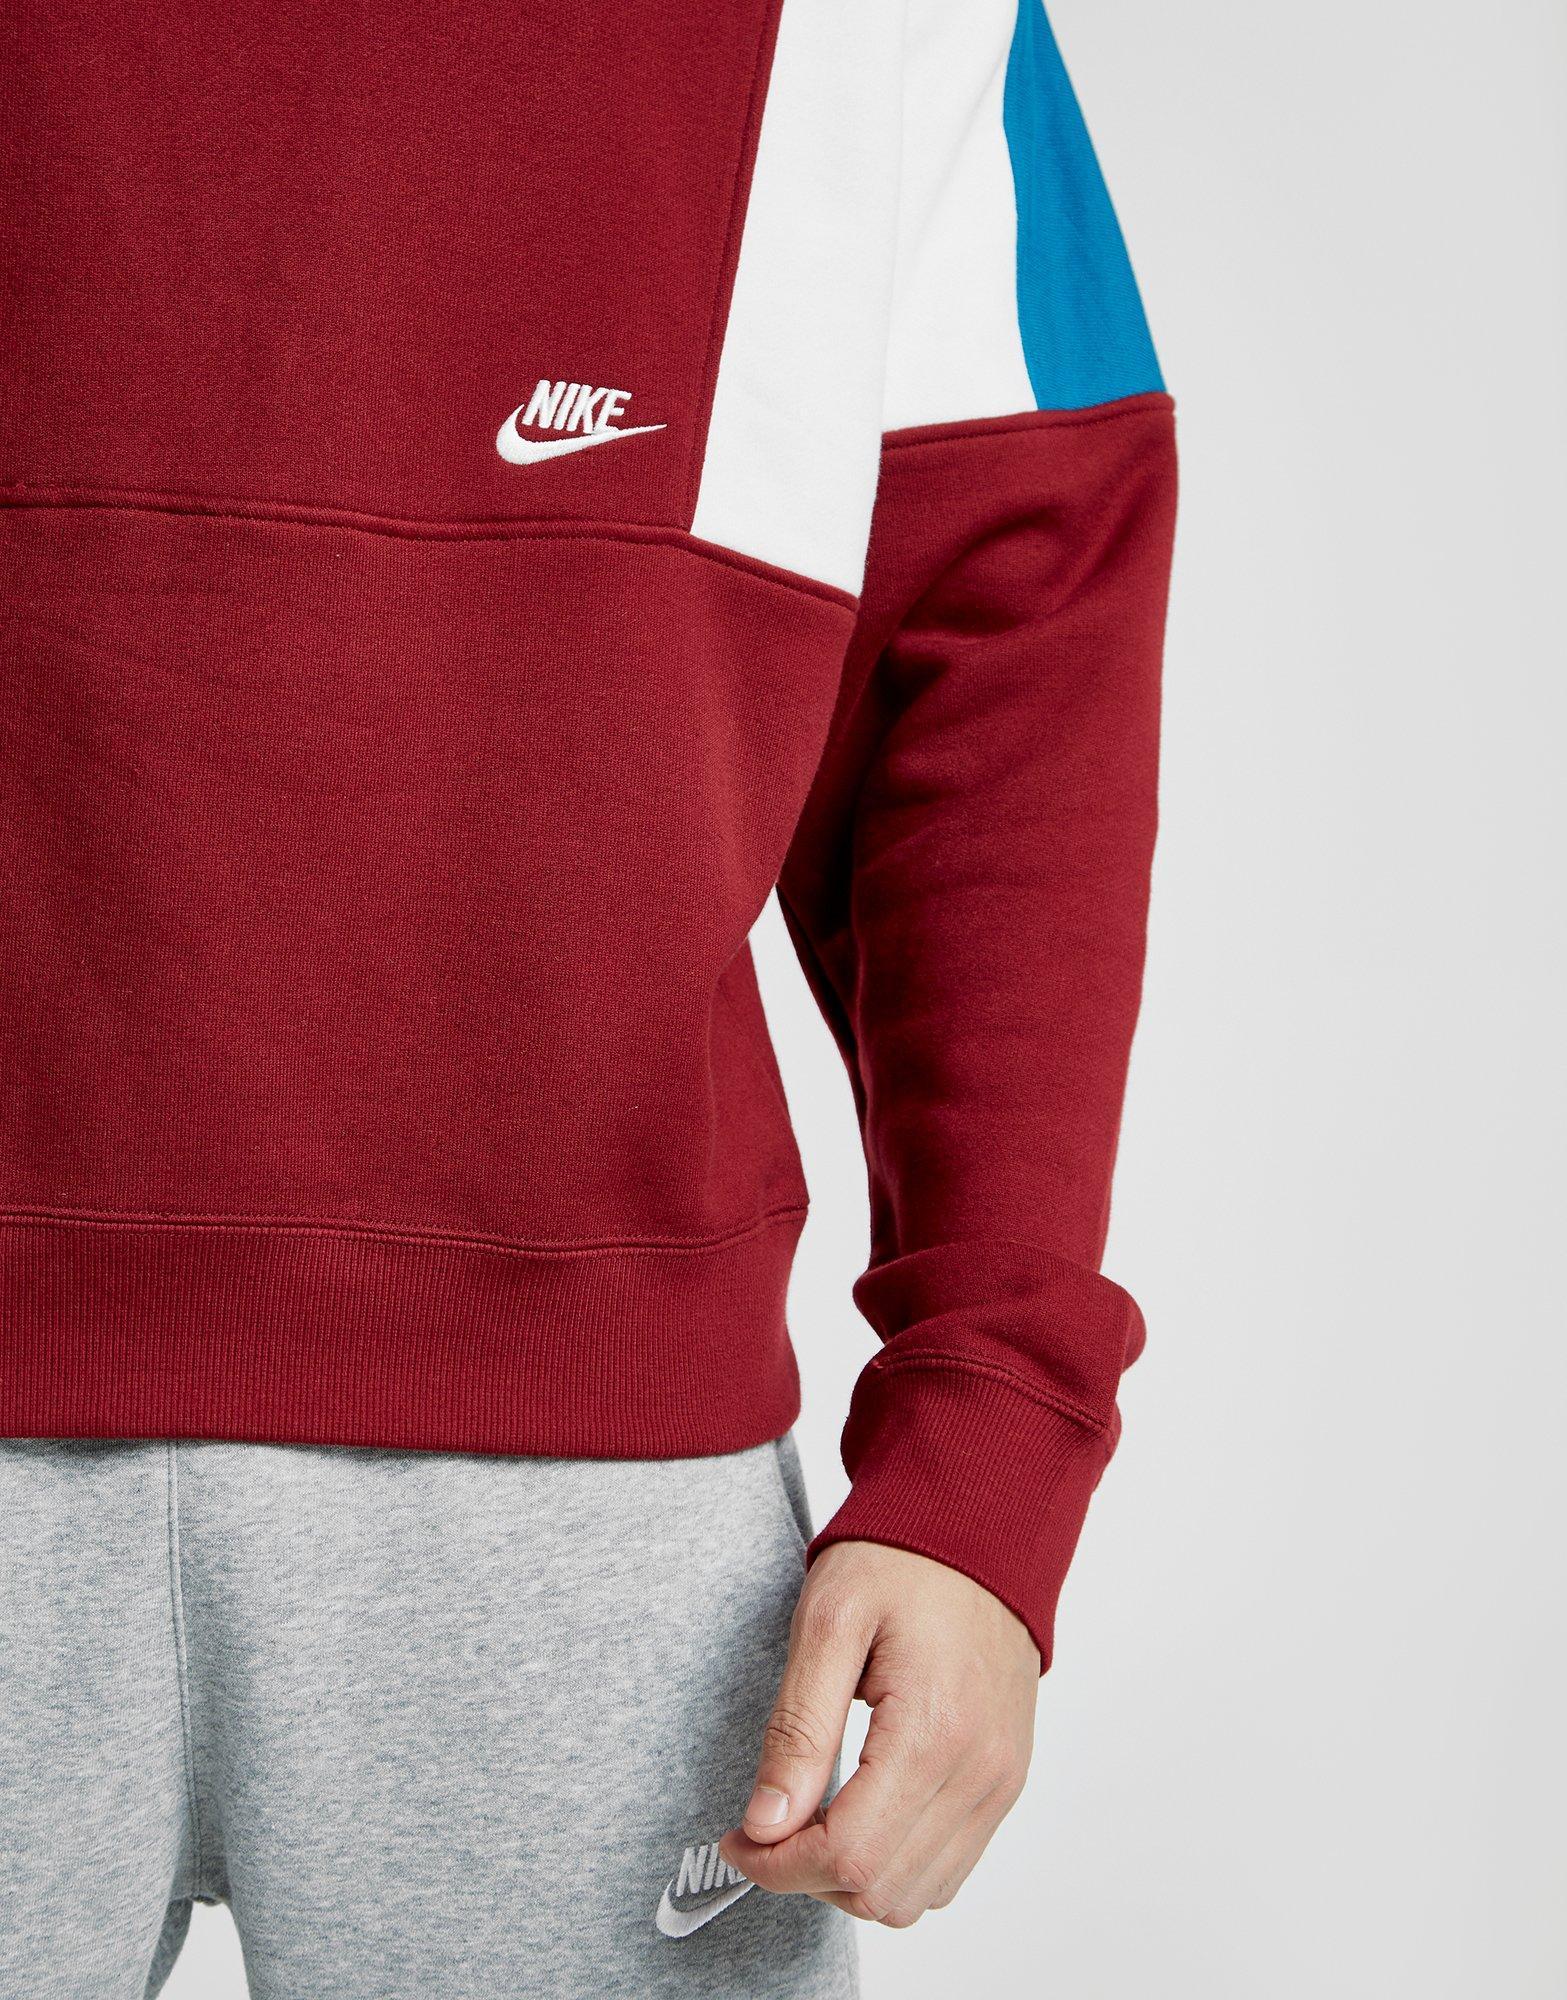 Predownload: Nike Cotton Reissue Crew Sweatshirt In Red Blue Red For Men Lyst [ 2000 x 1567 Pixel ]